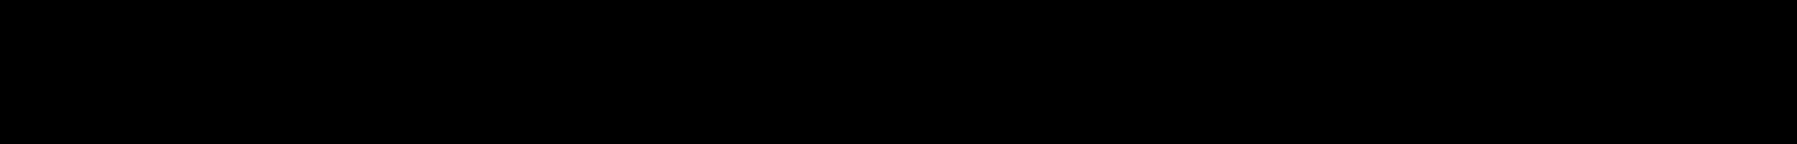 LINEスキマニの3つの特徴